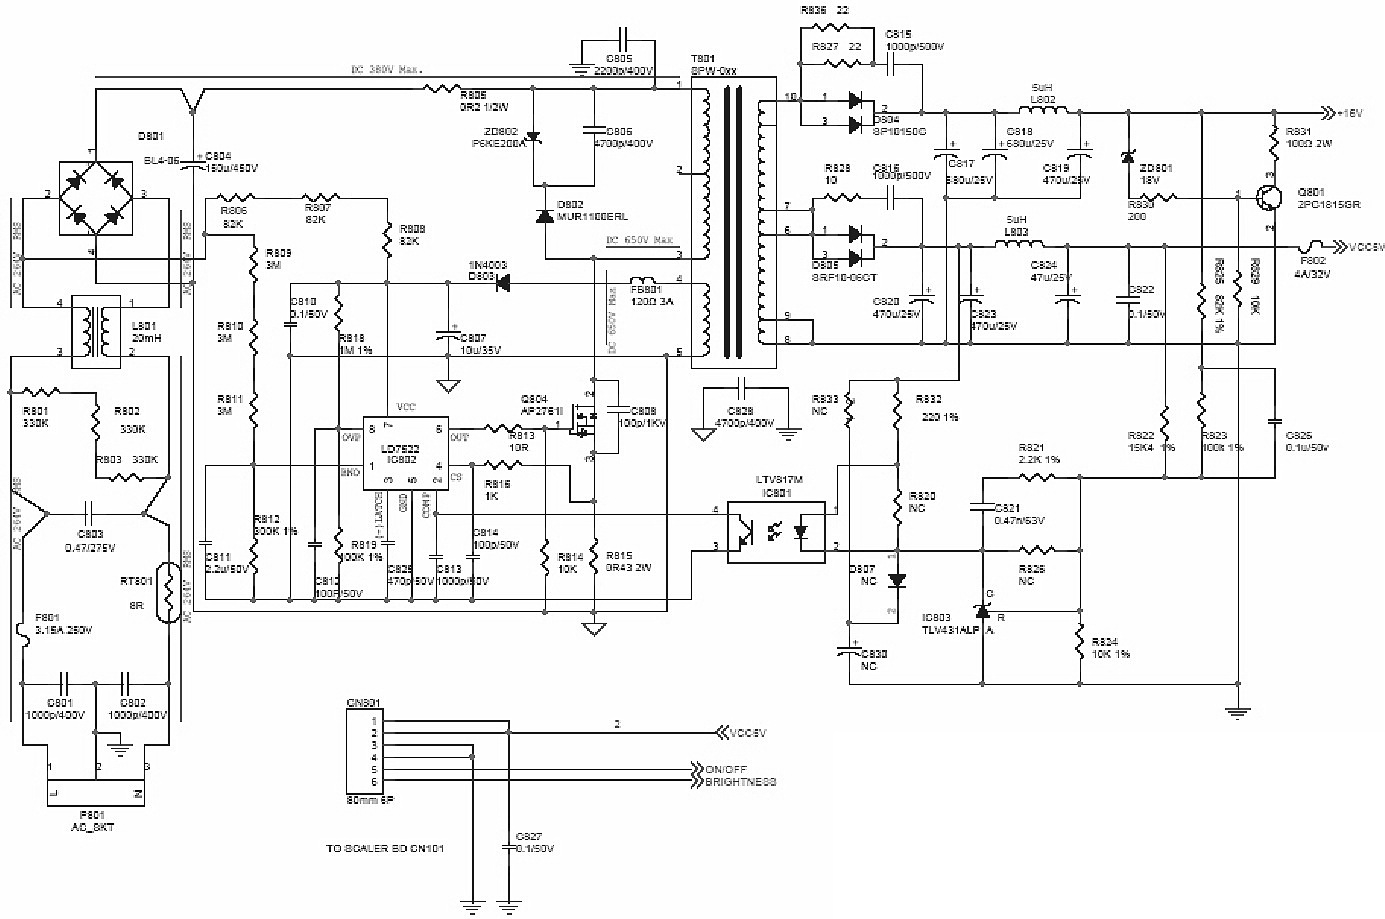 Lg Flatron W2234s Sni W2234s Bni Lcd Monitor Smps